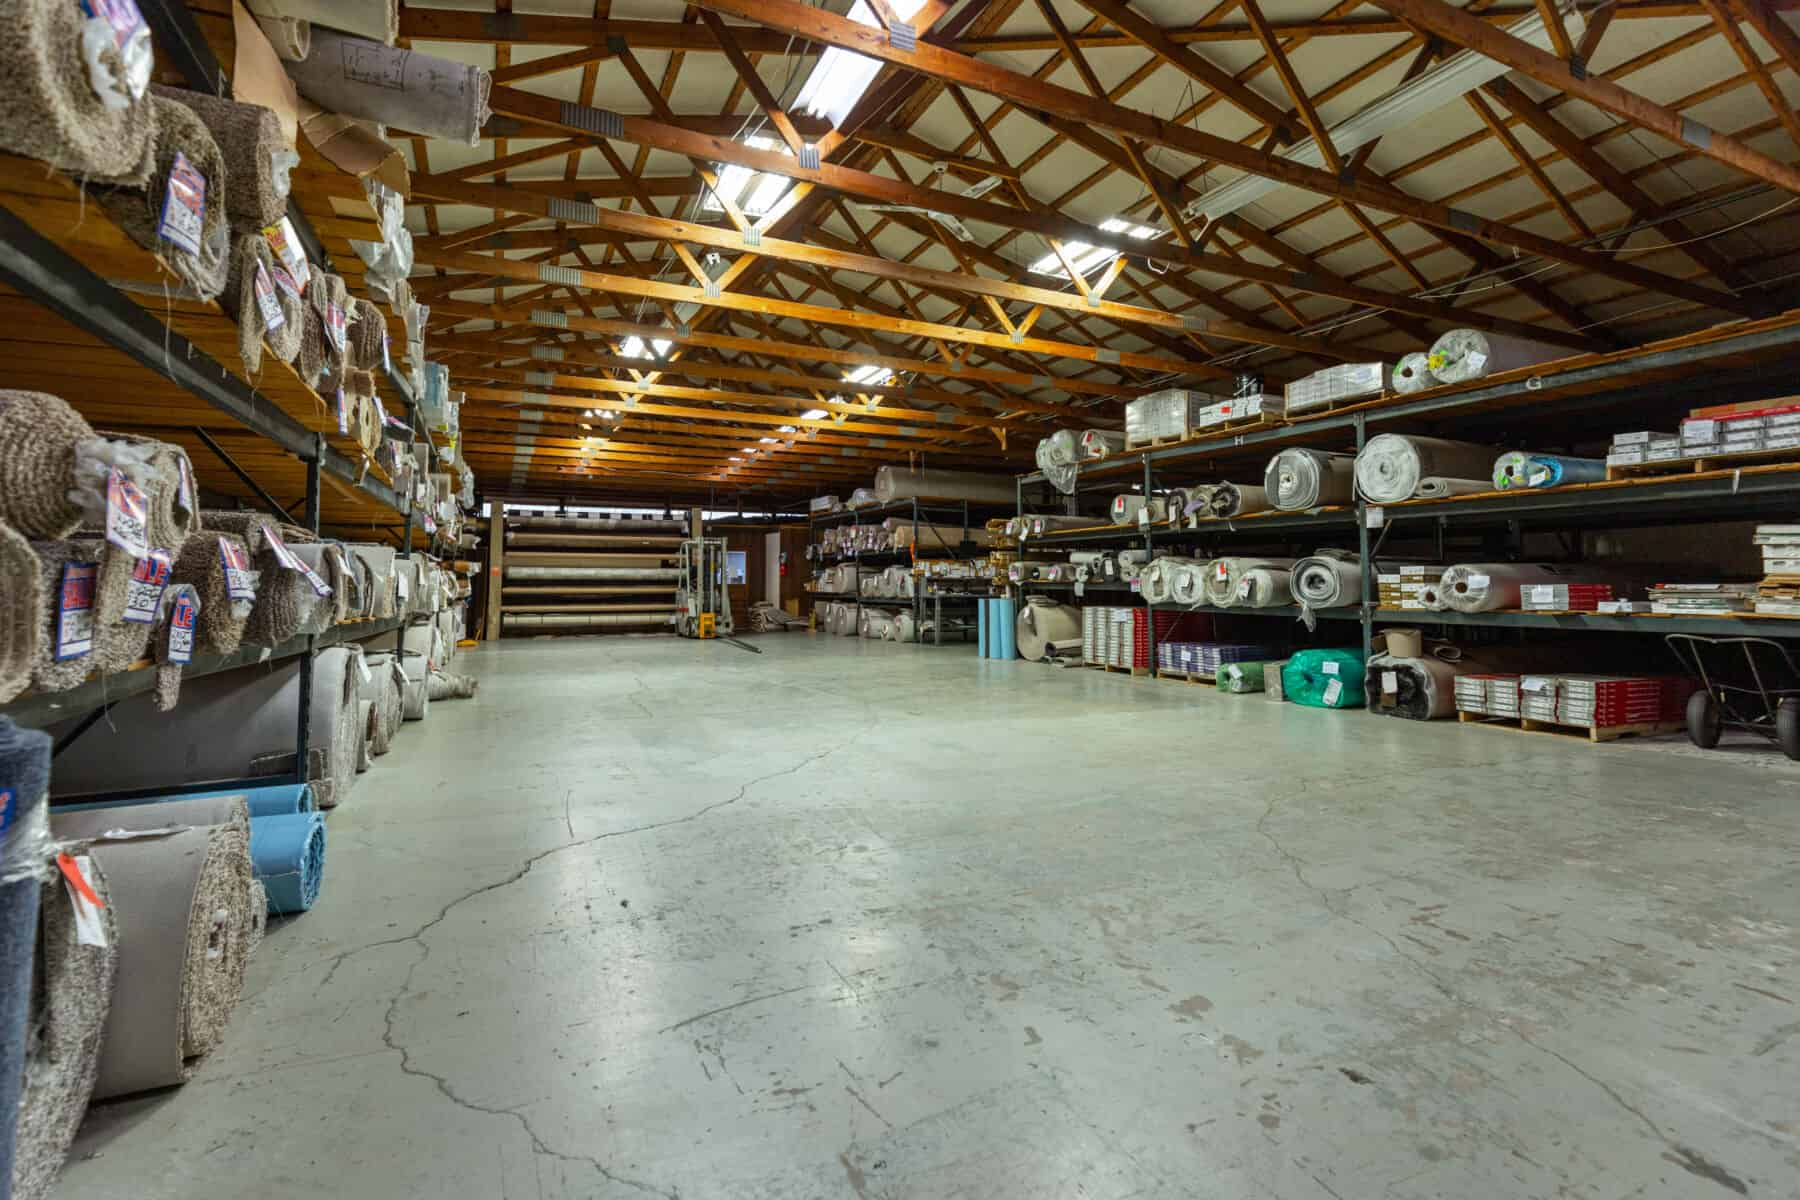 Warehouse of carpet rolls